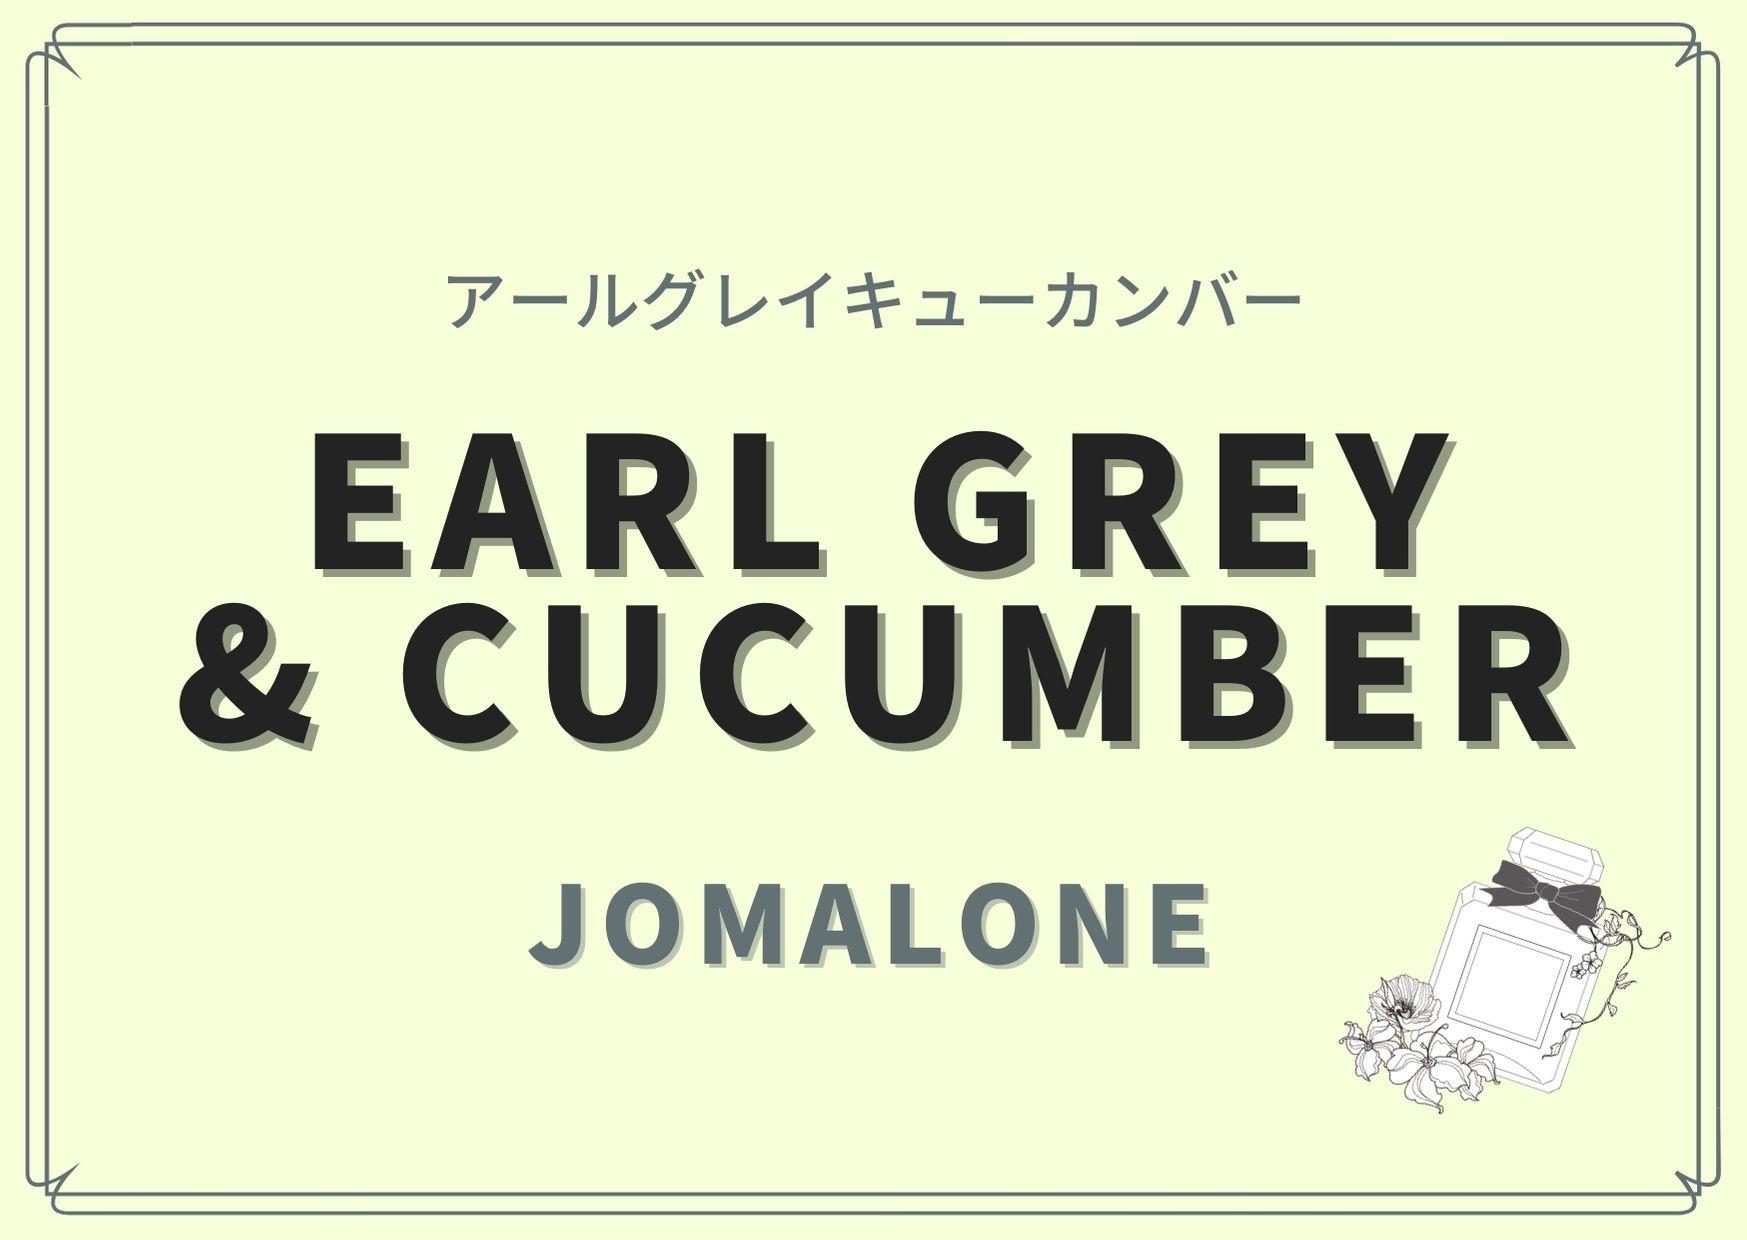 Earl Grey & Cucumber(アールグレイキューカンバー)/JoMalone(ジョーマローン)